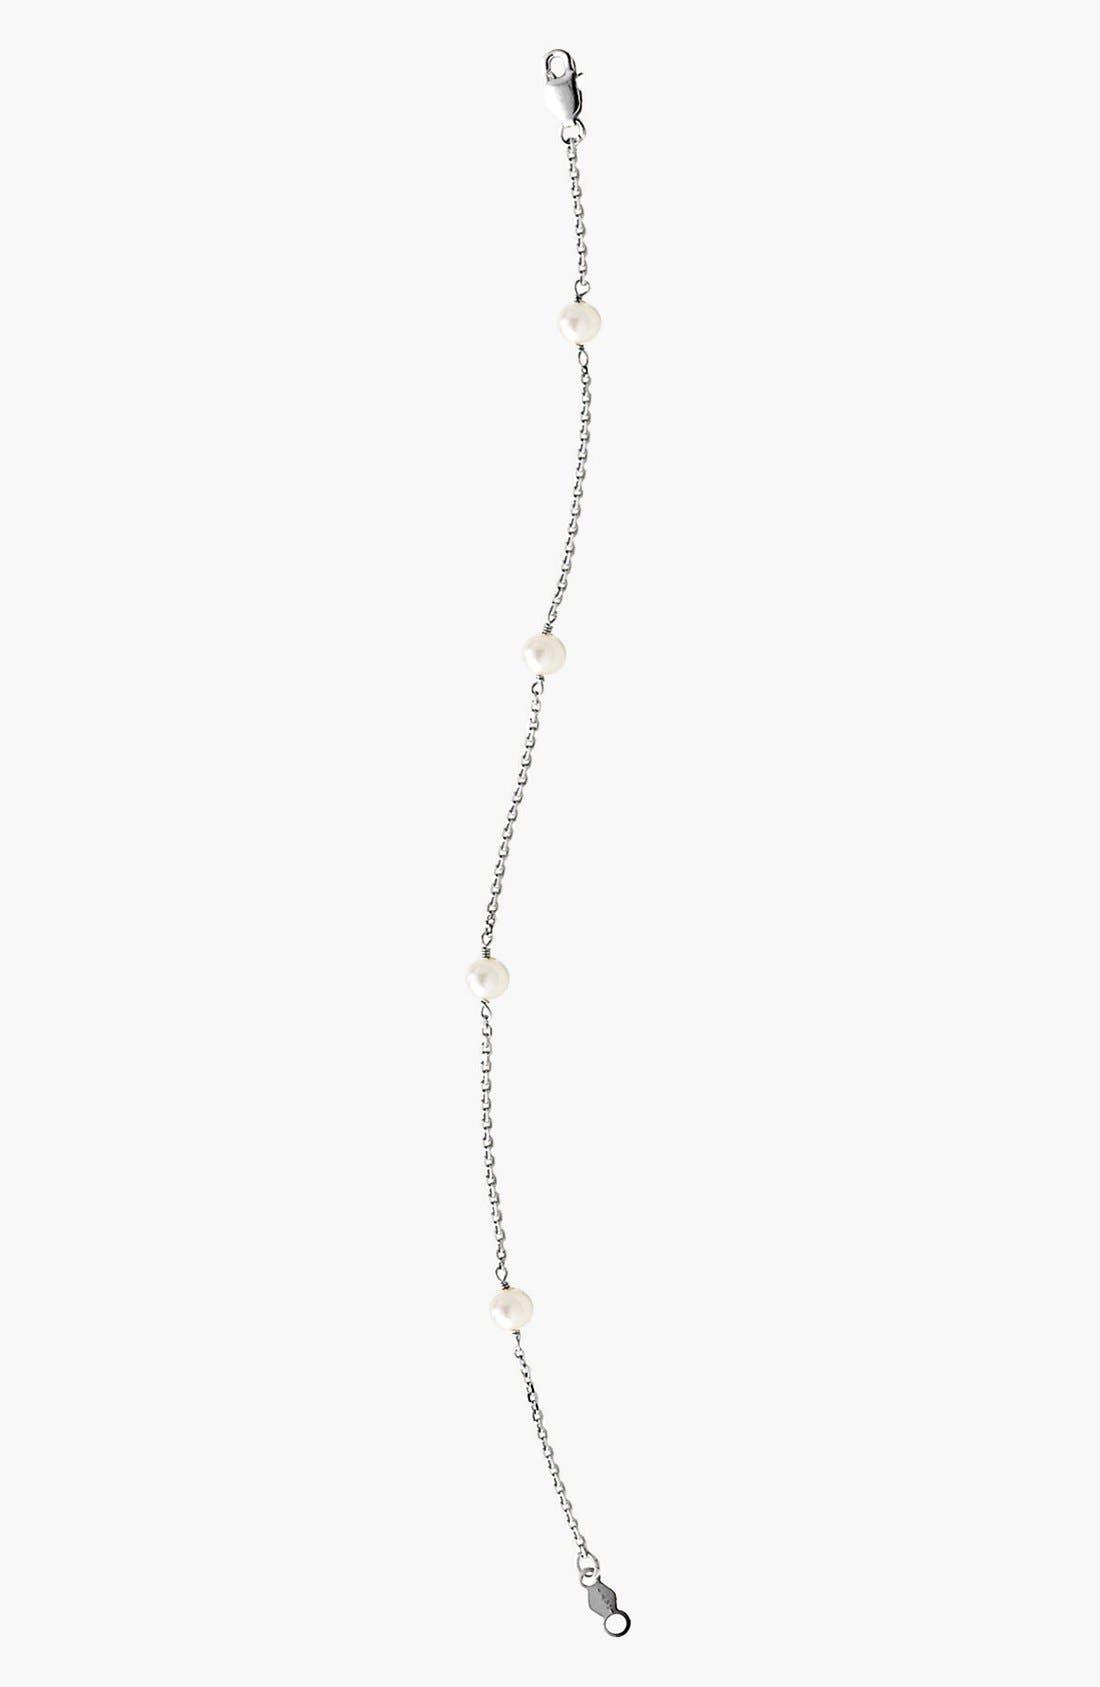 14k White Gold & Cultured Pearl Bracelet,                             Main thumbnail 1, color,